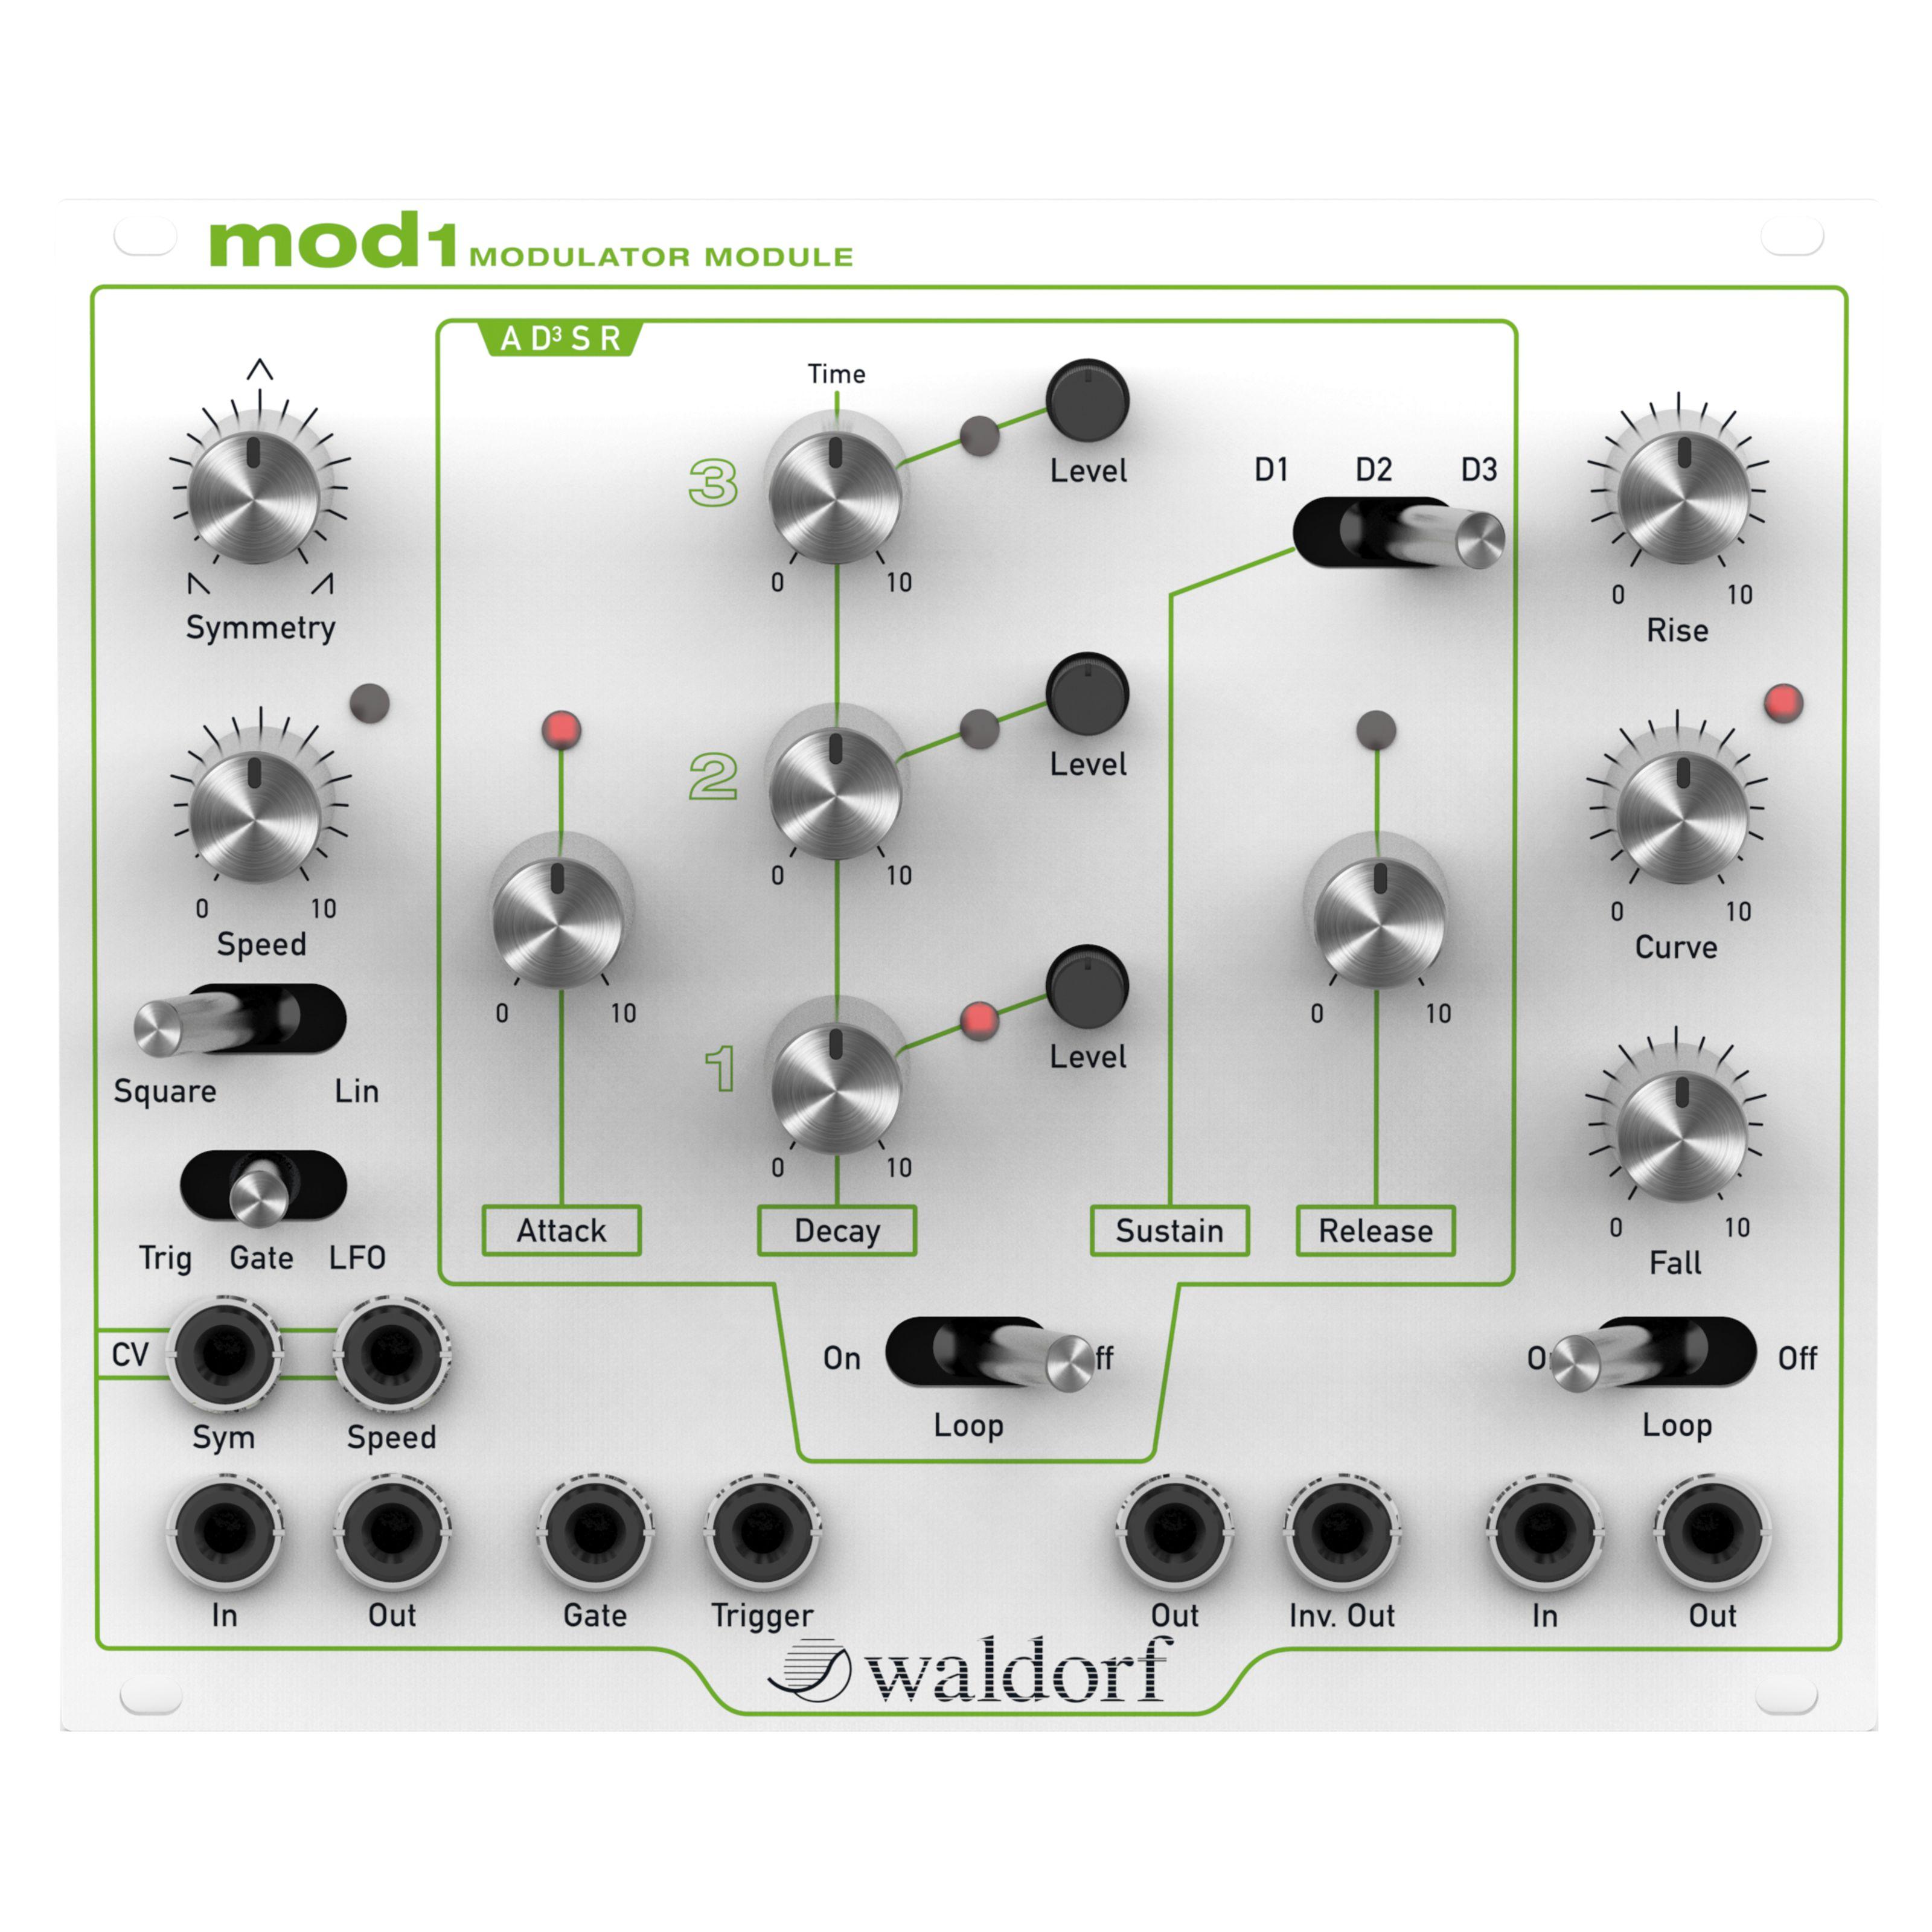 Waldorf - MOD1